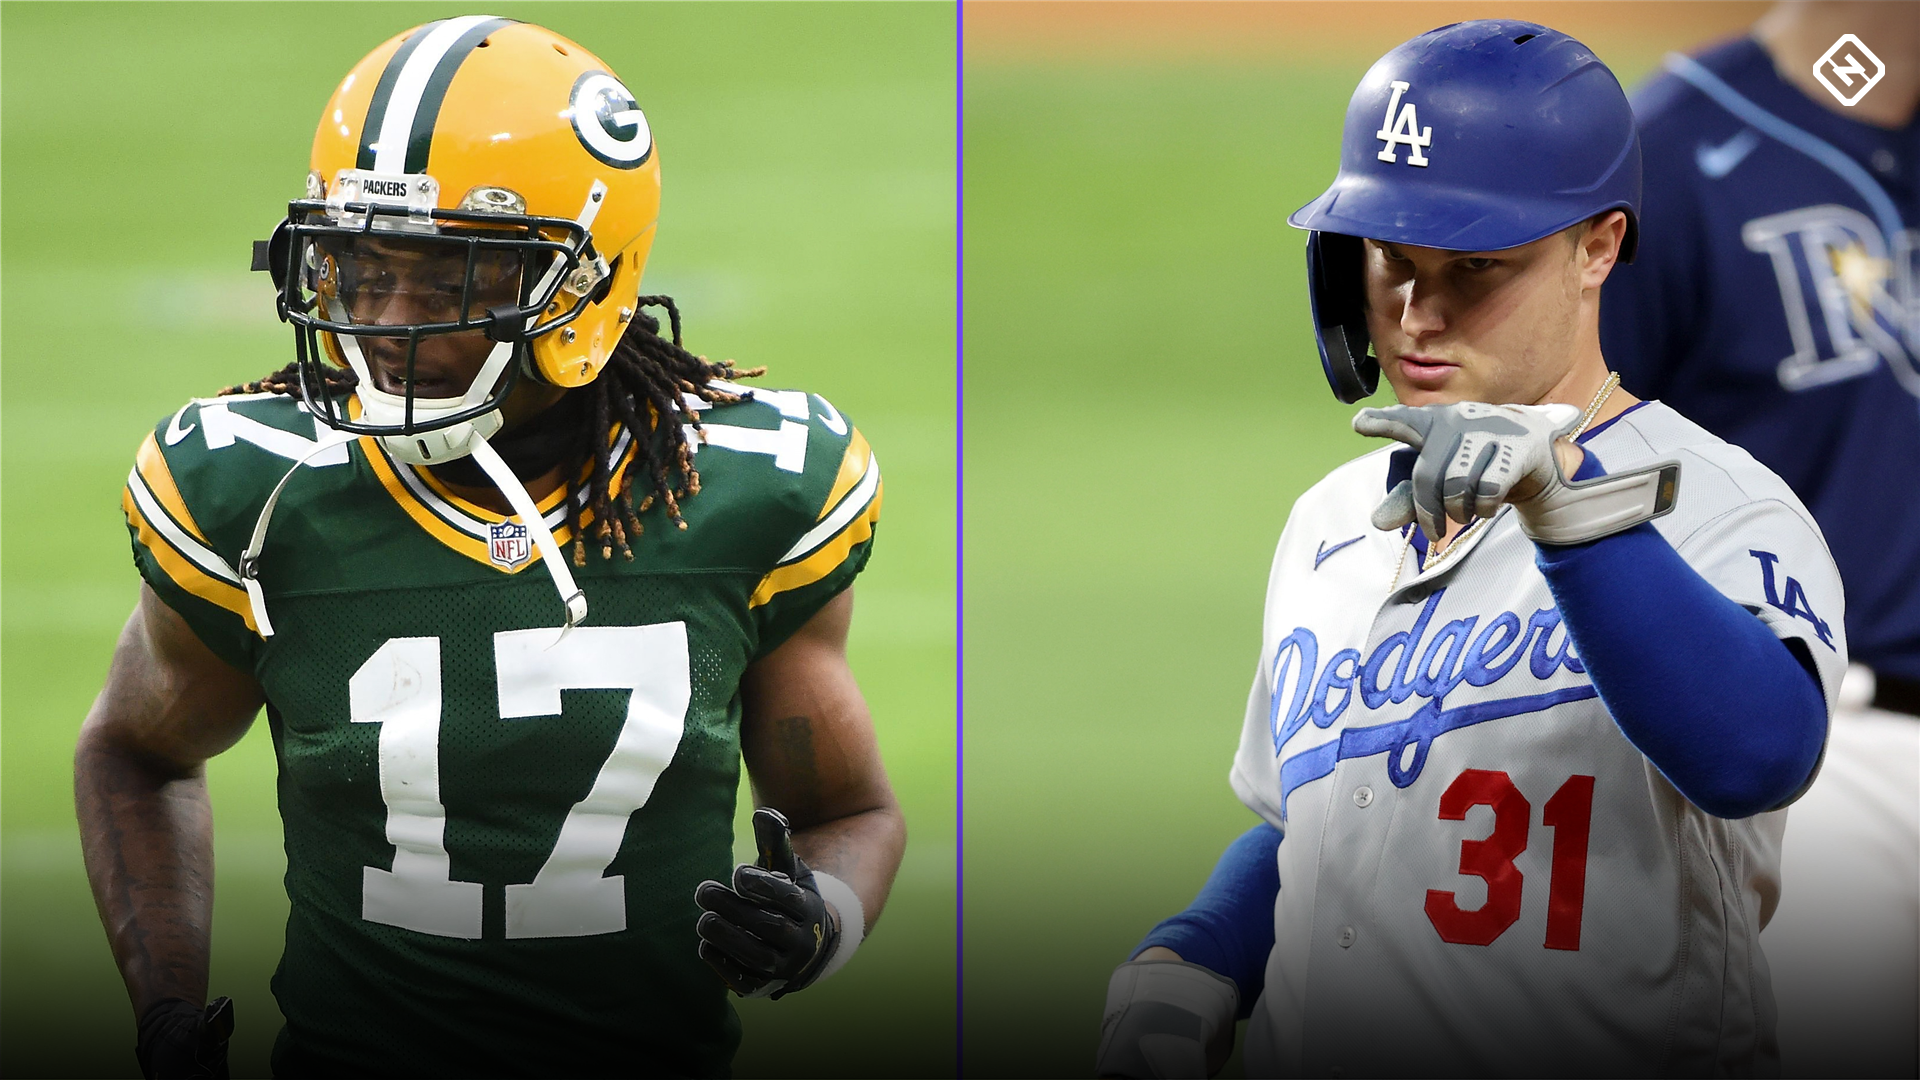 Packers' Davante Adams, Dodgers' Joc Pederson formed dynamic receiver duo in high school